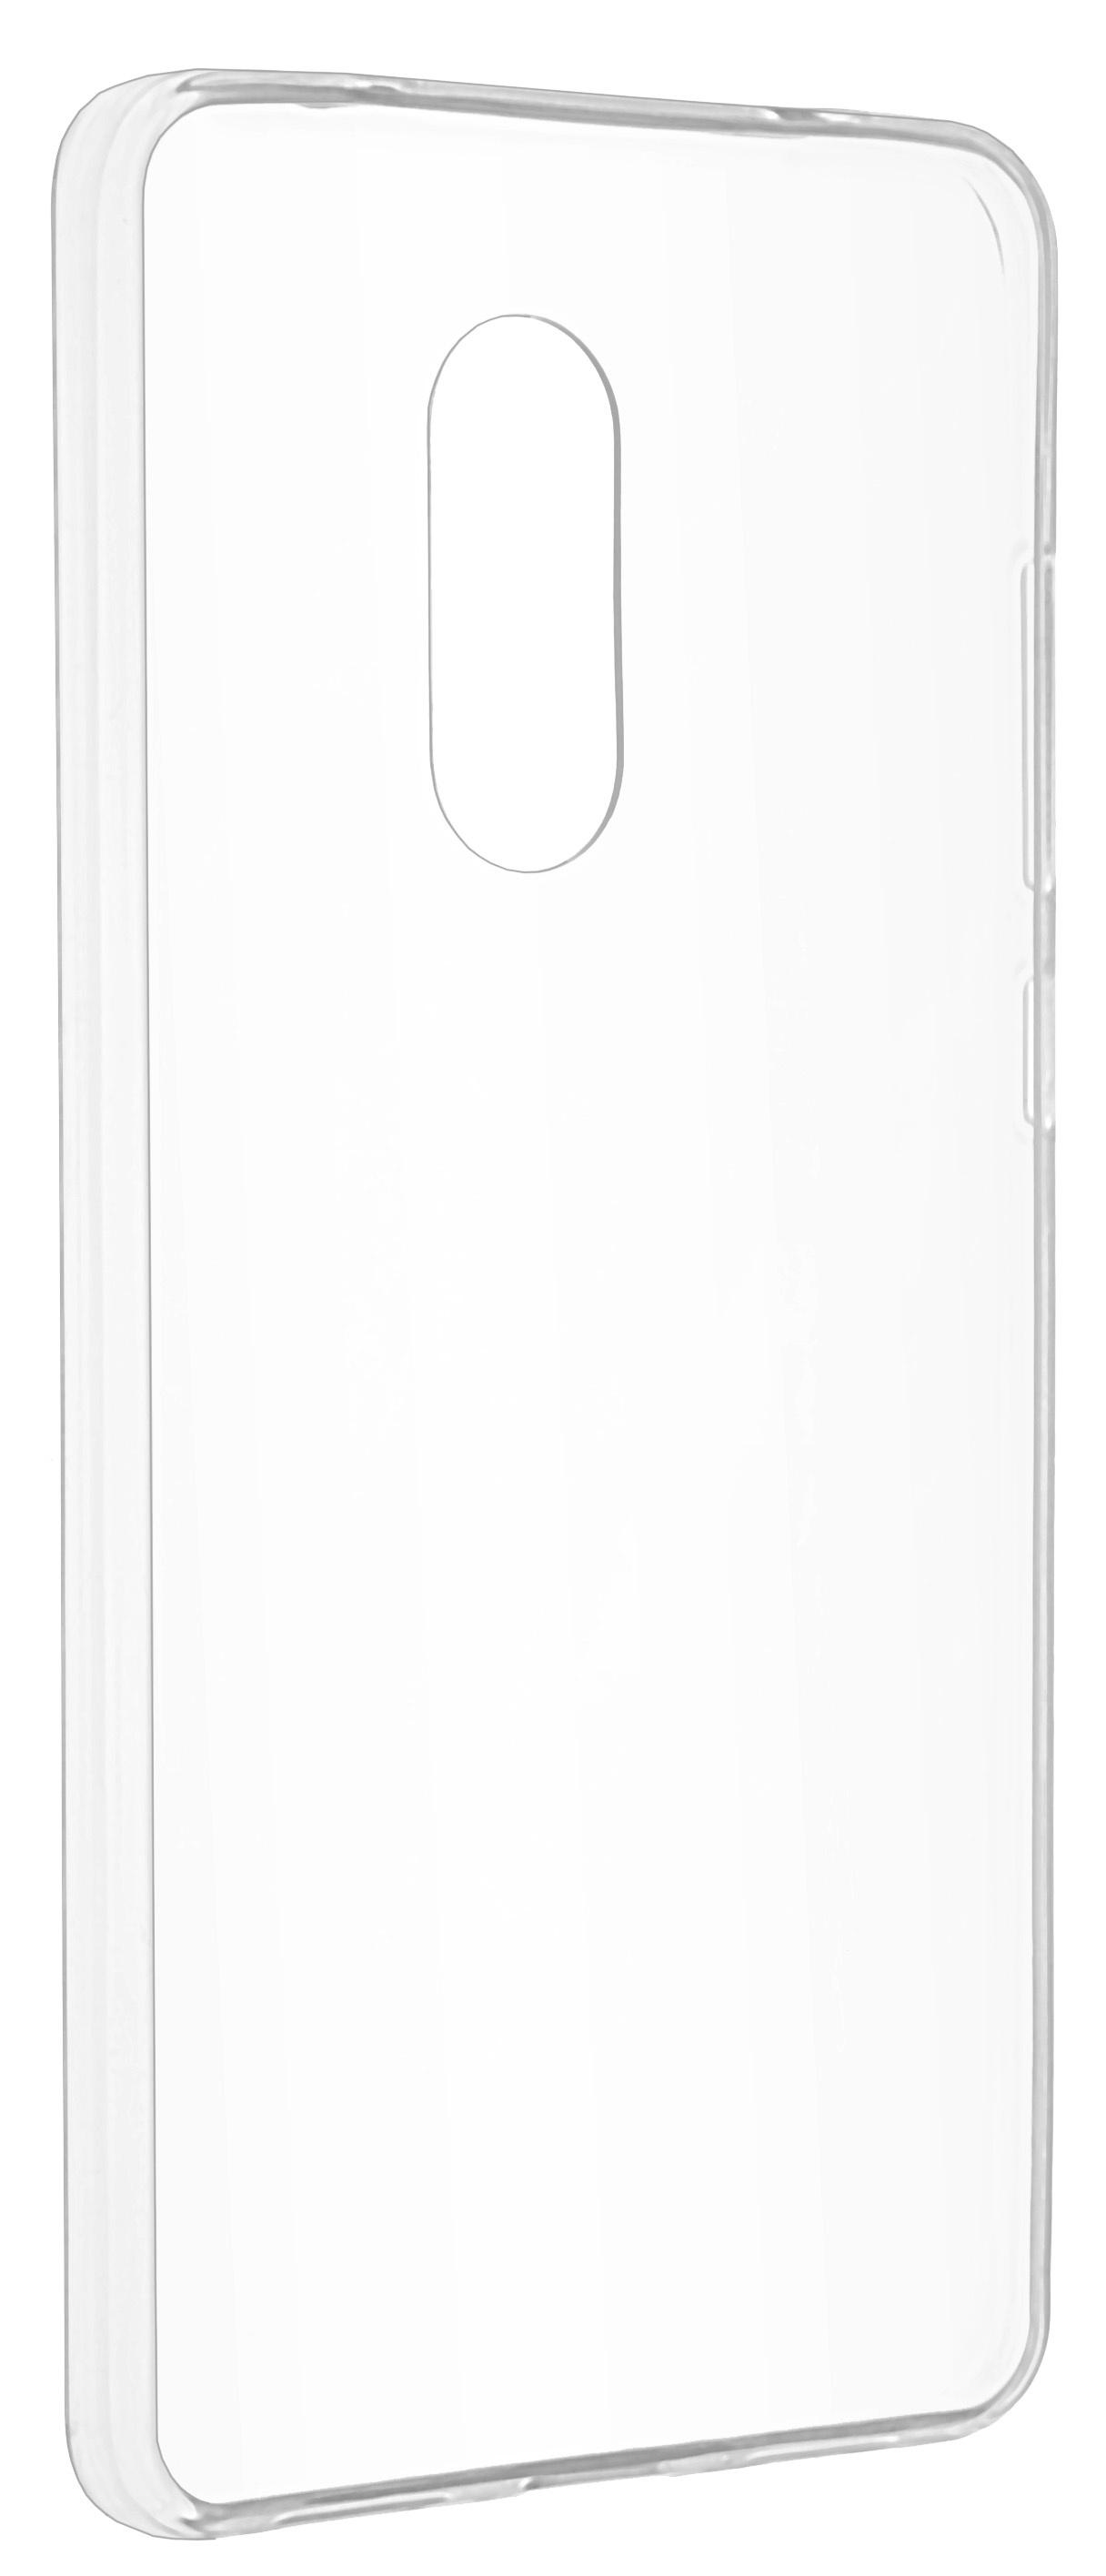 Чехол для сотового телефона skinBOX Slim Silicone, 4660041408850, прозрачный цена и фото